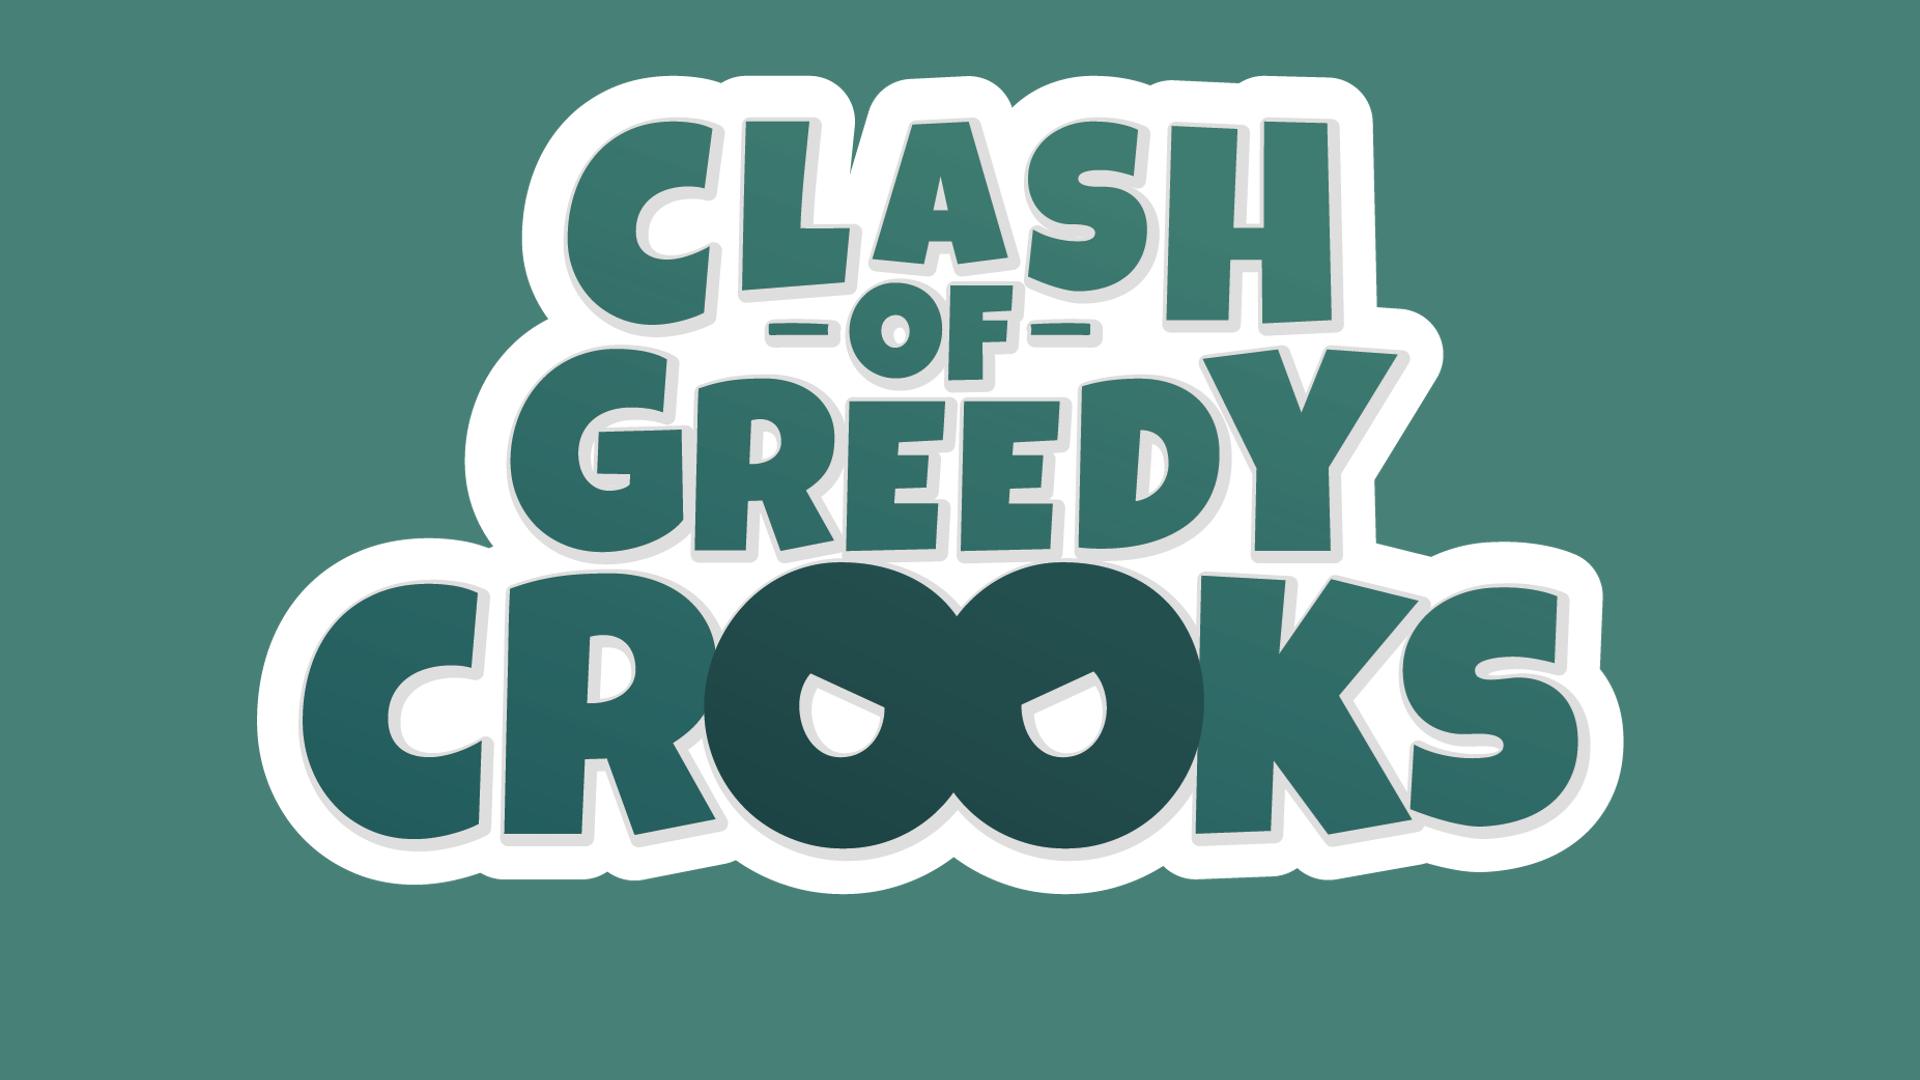 Clash of Greedy Crooks